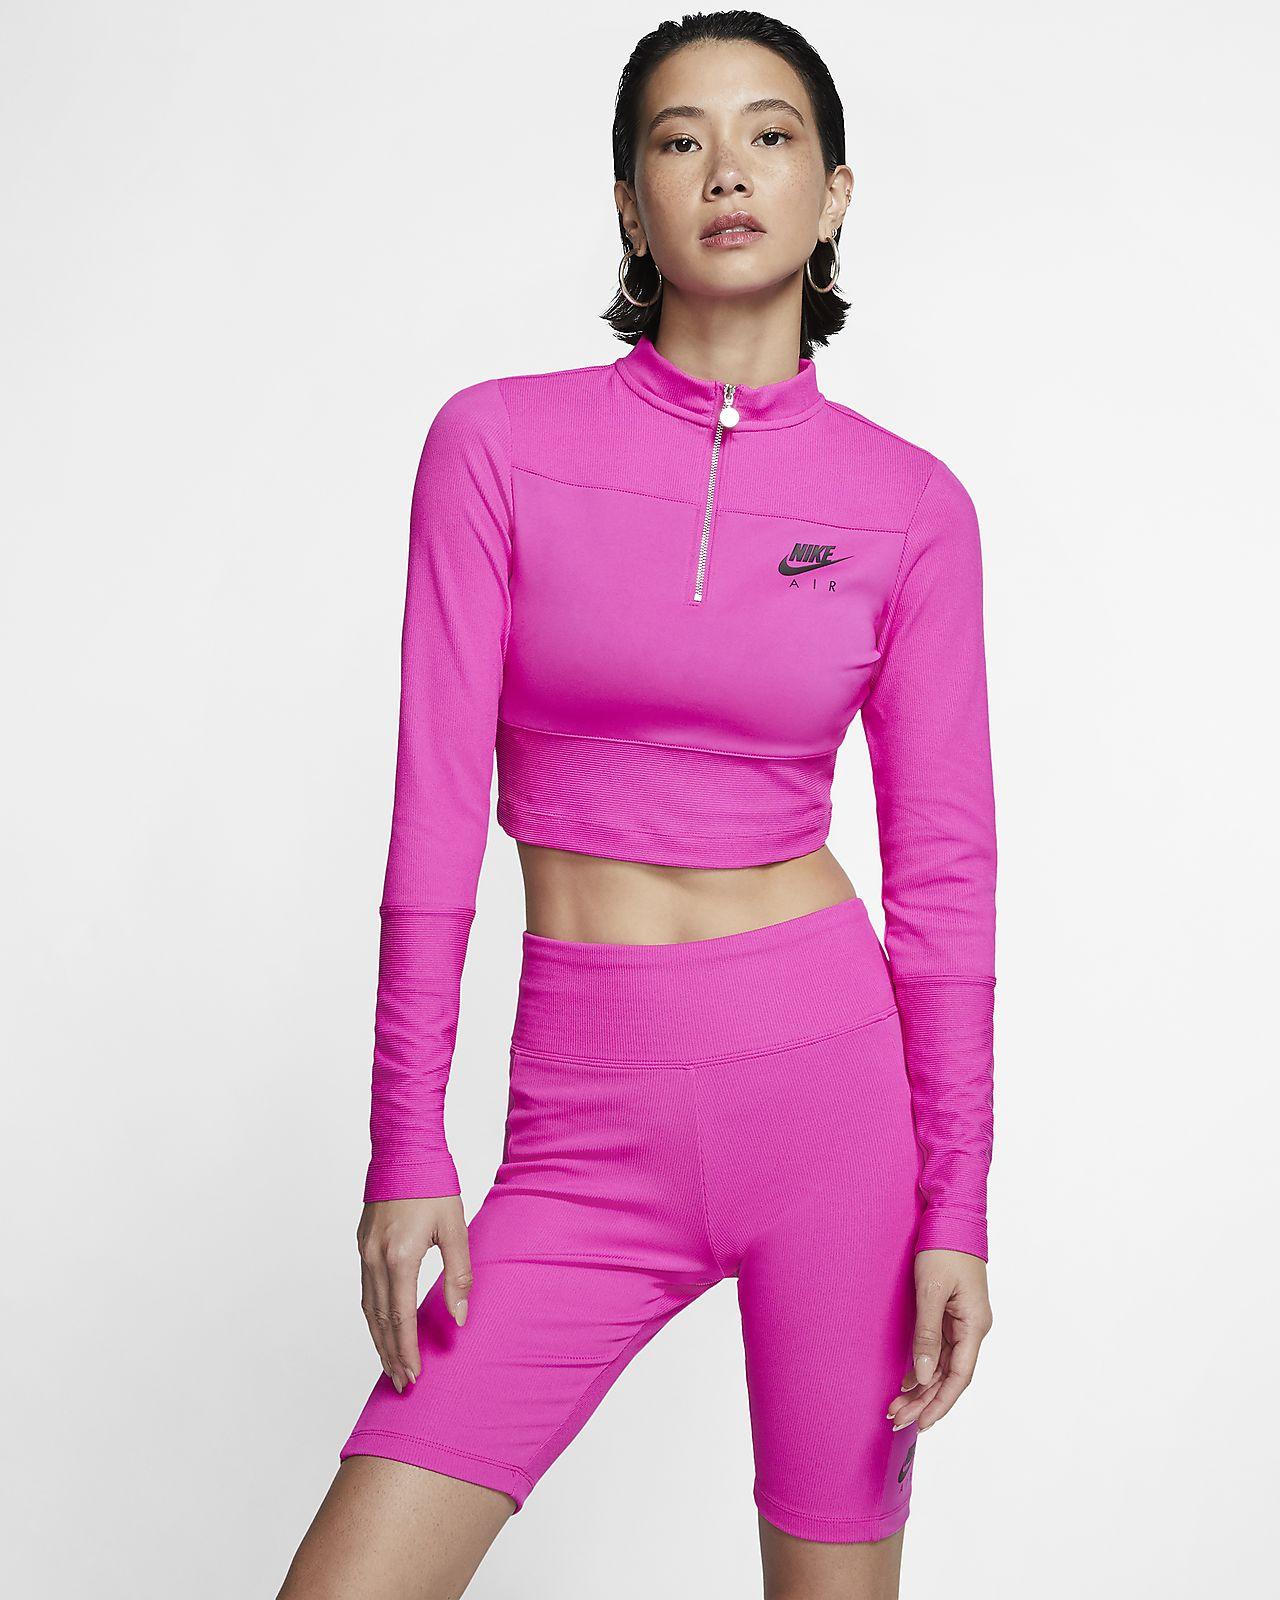 Nike Air Women's Ribbed Long-Sleeve Top